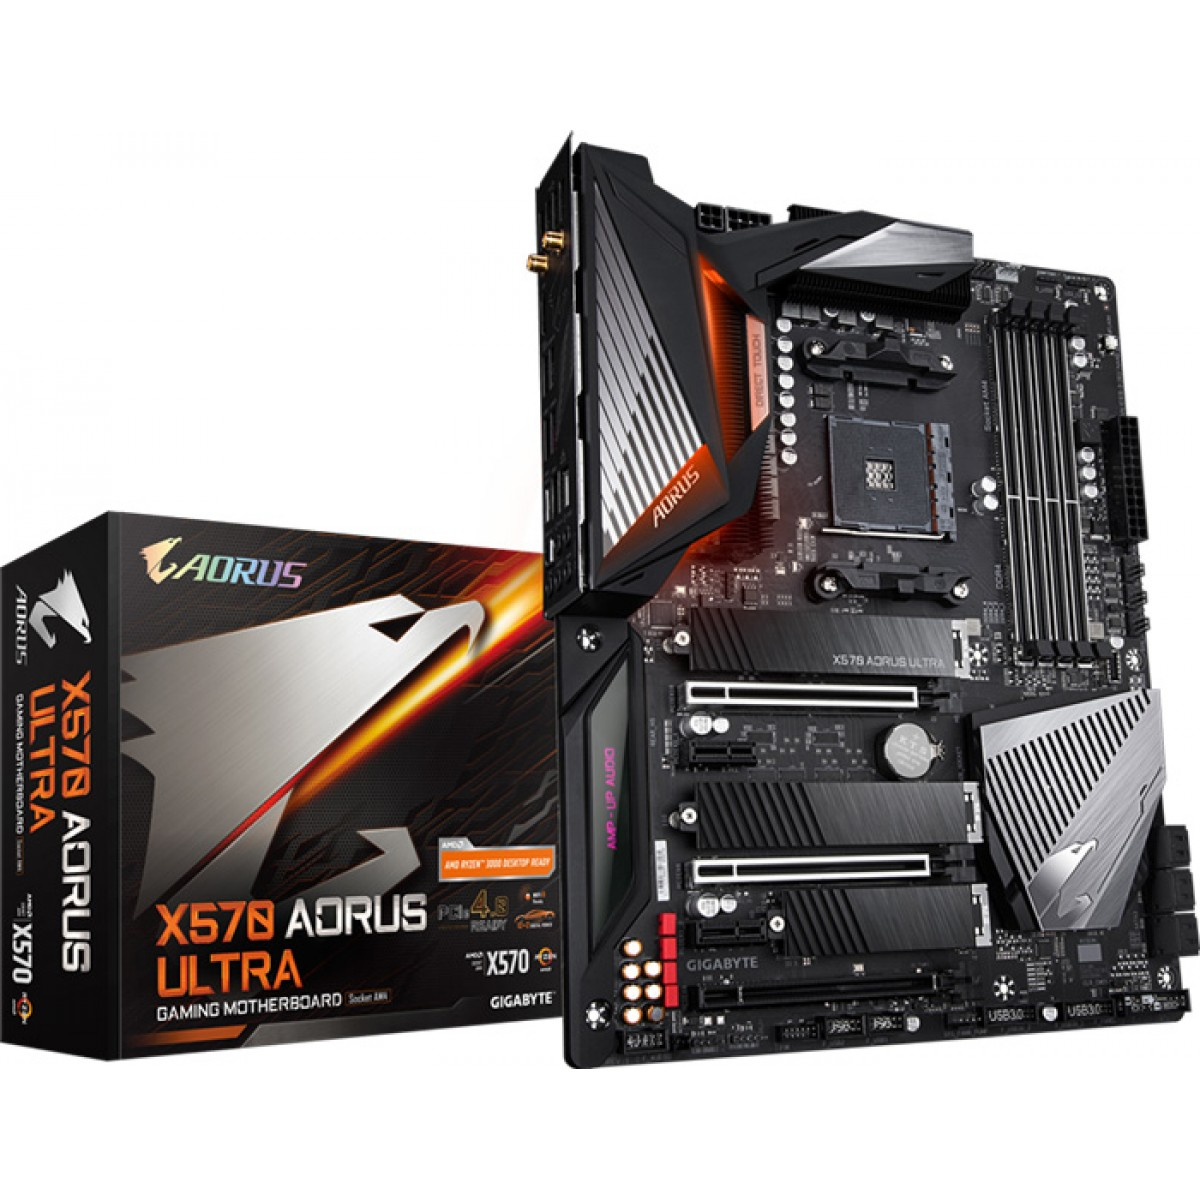 Placa Mãe Gigabyte X570 Aorus Ultra Wifi, Chipset X570, AMD AM4, ATX, DDR4